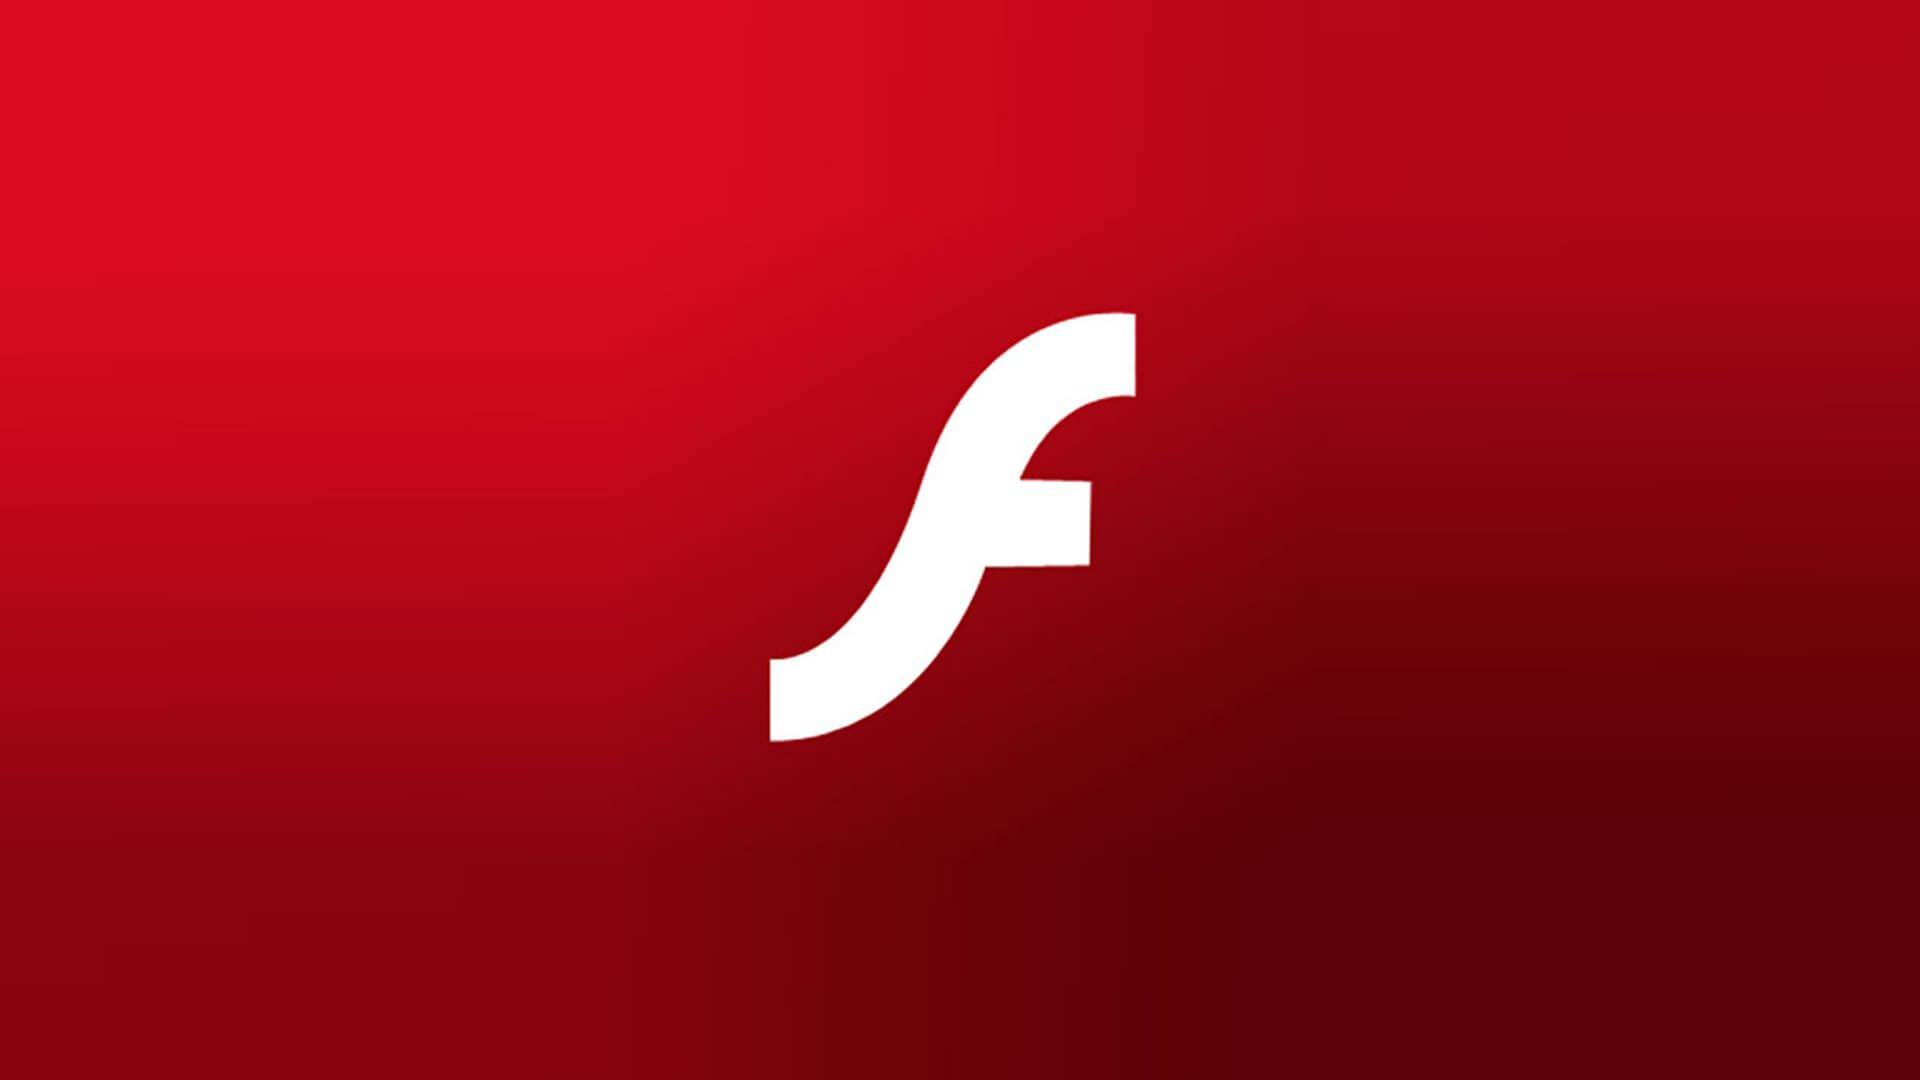 adobe flash player 21 00 197 1